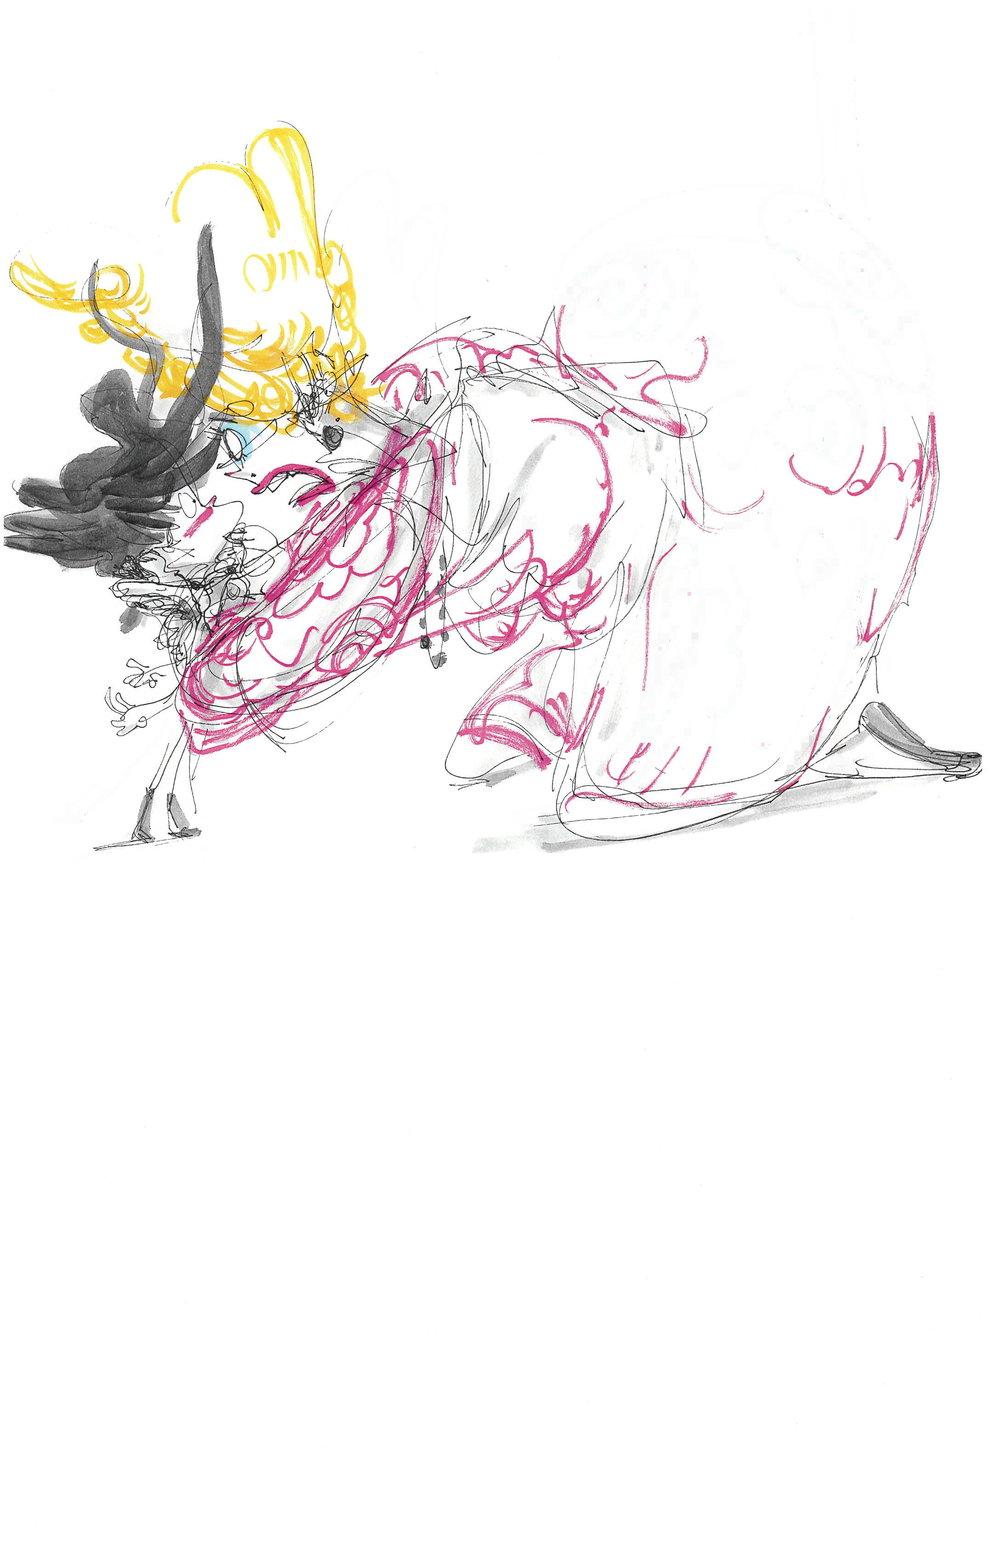 BRIANWONDERS-sketches-1_Page_09_Image_0001.jpg